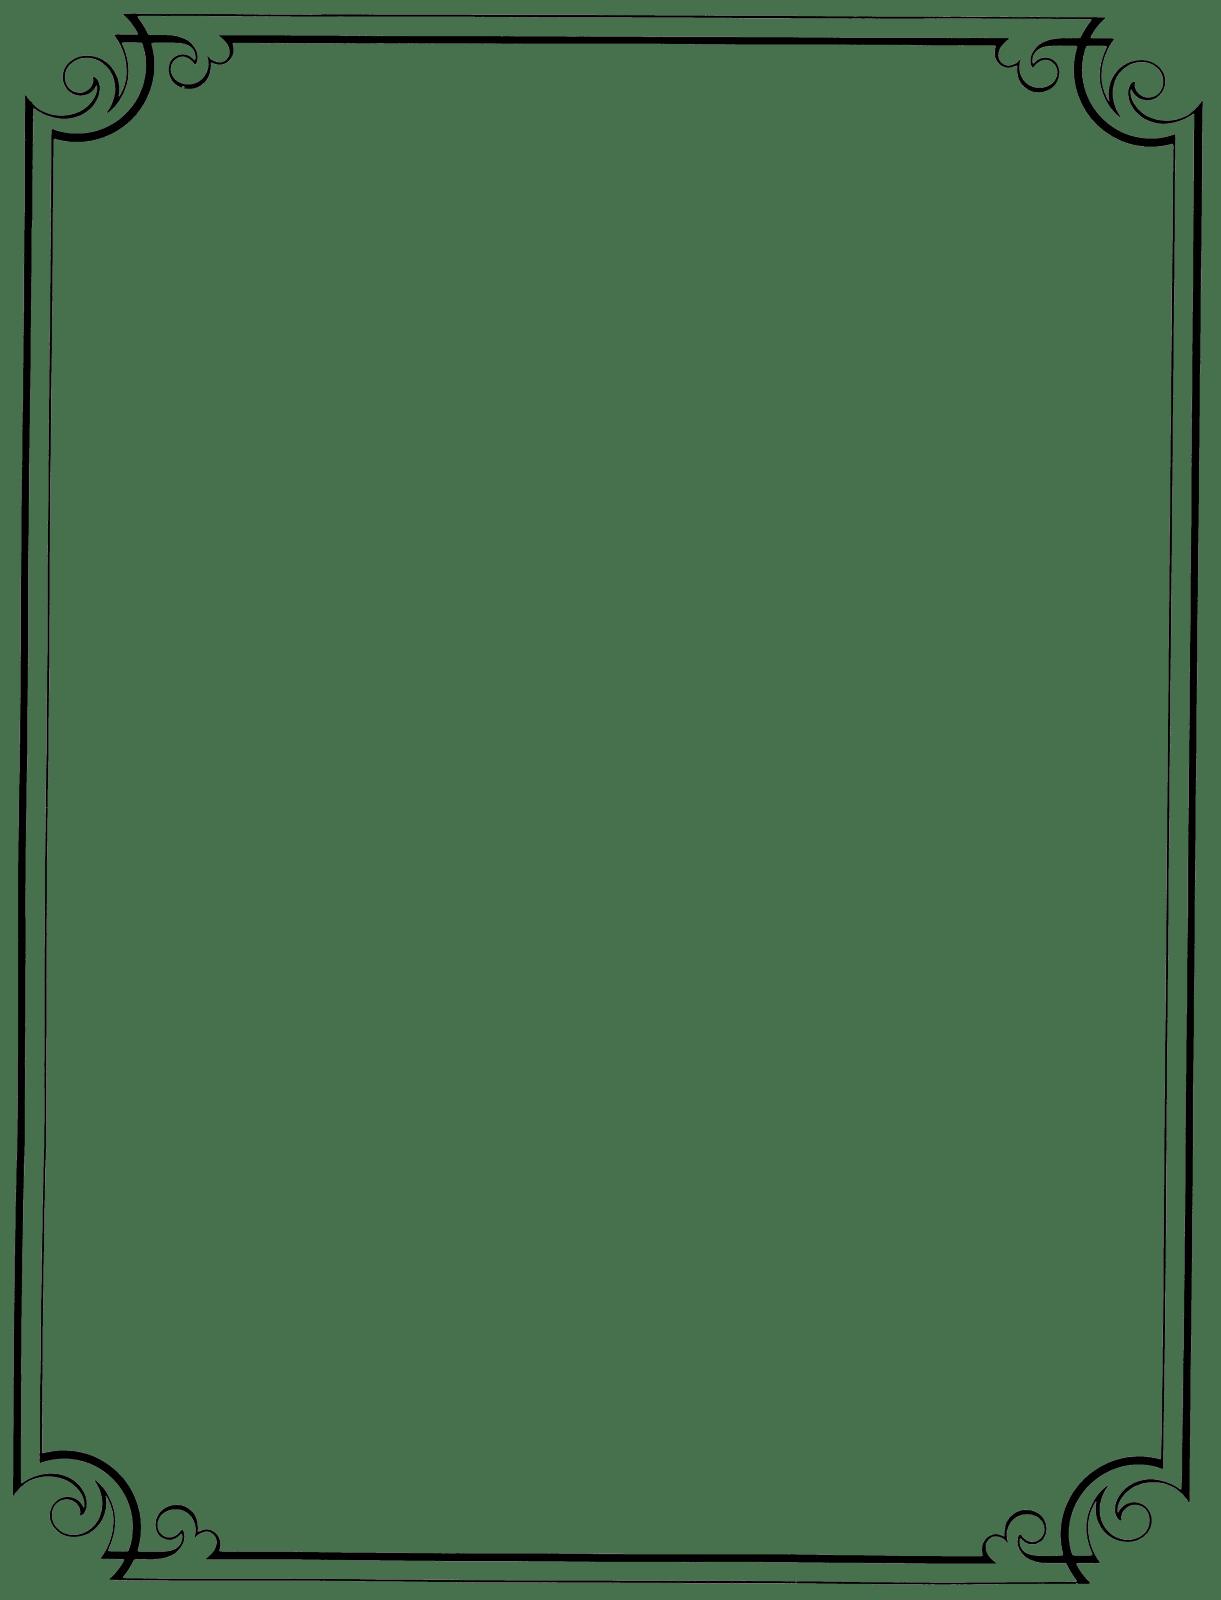 Resume Border Clipart